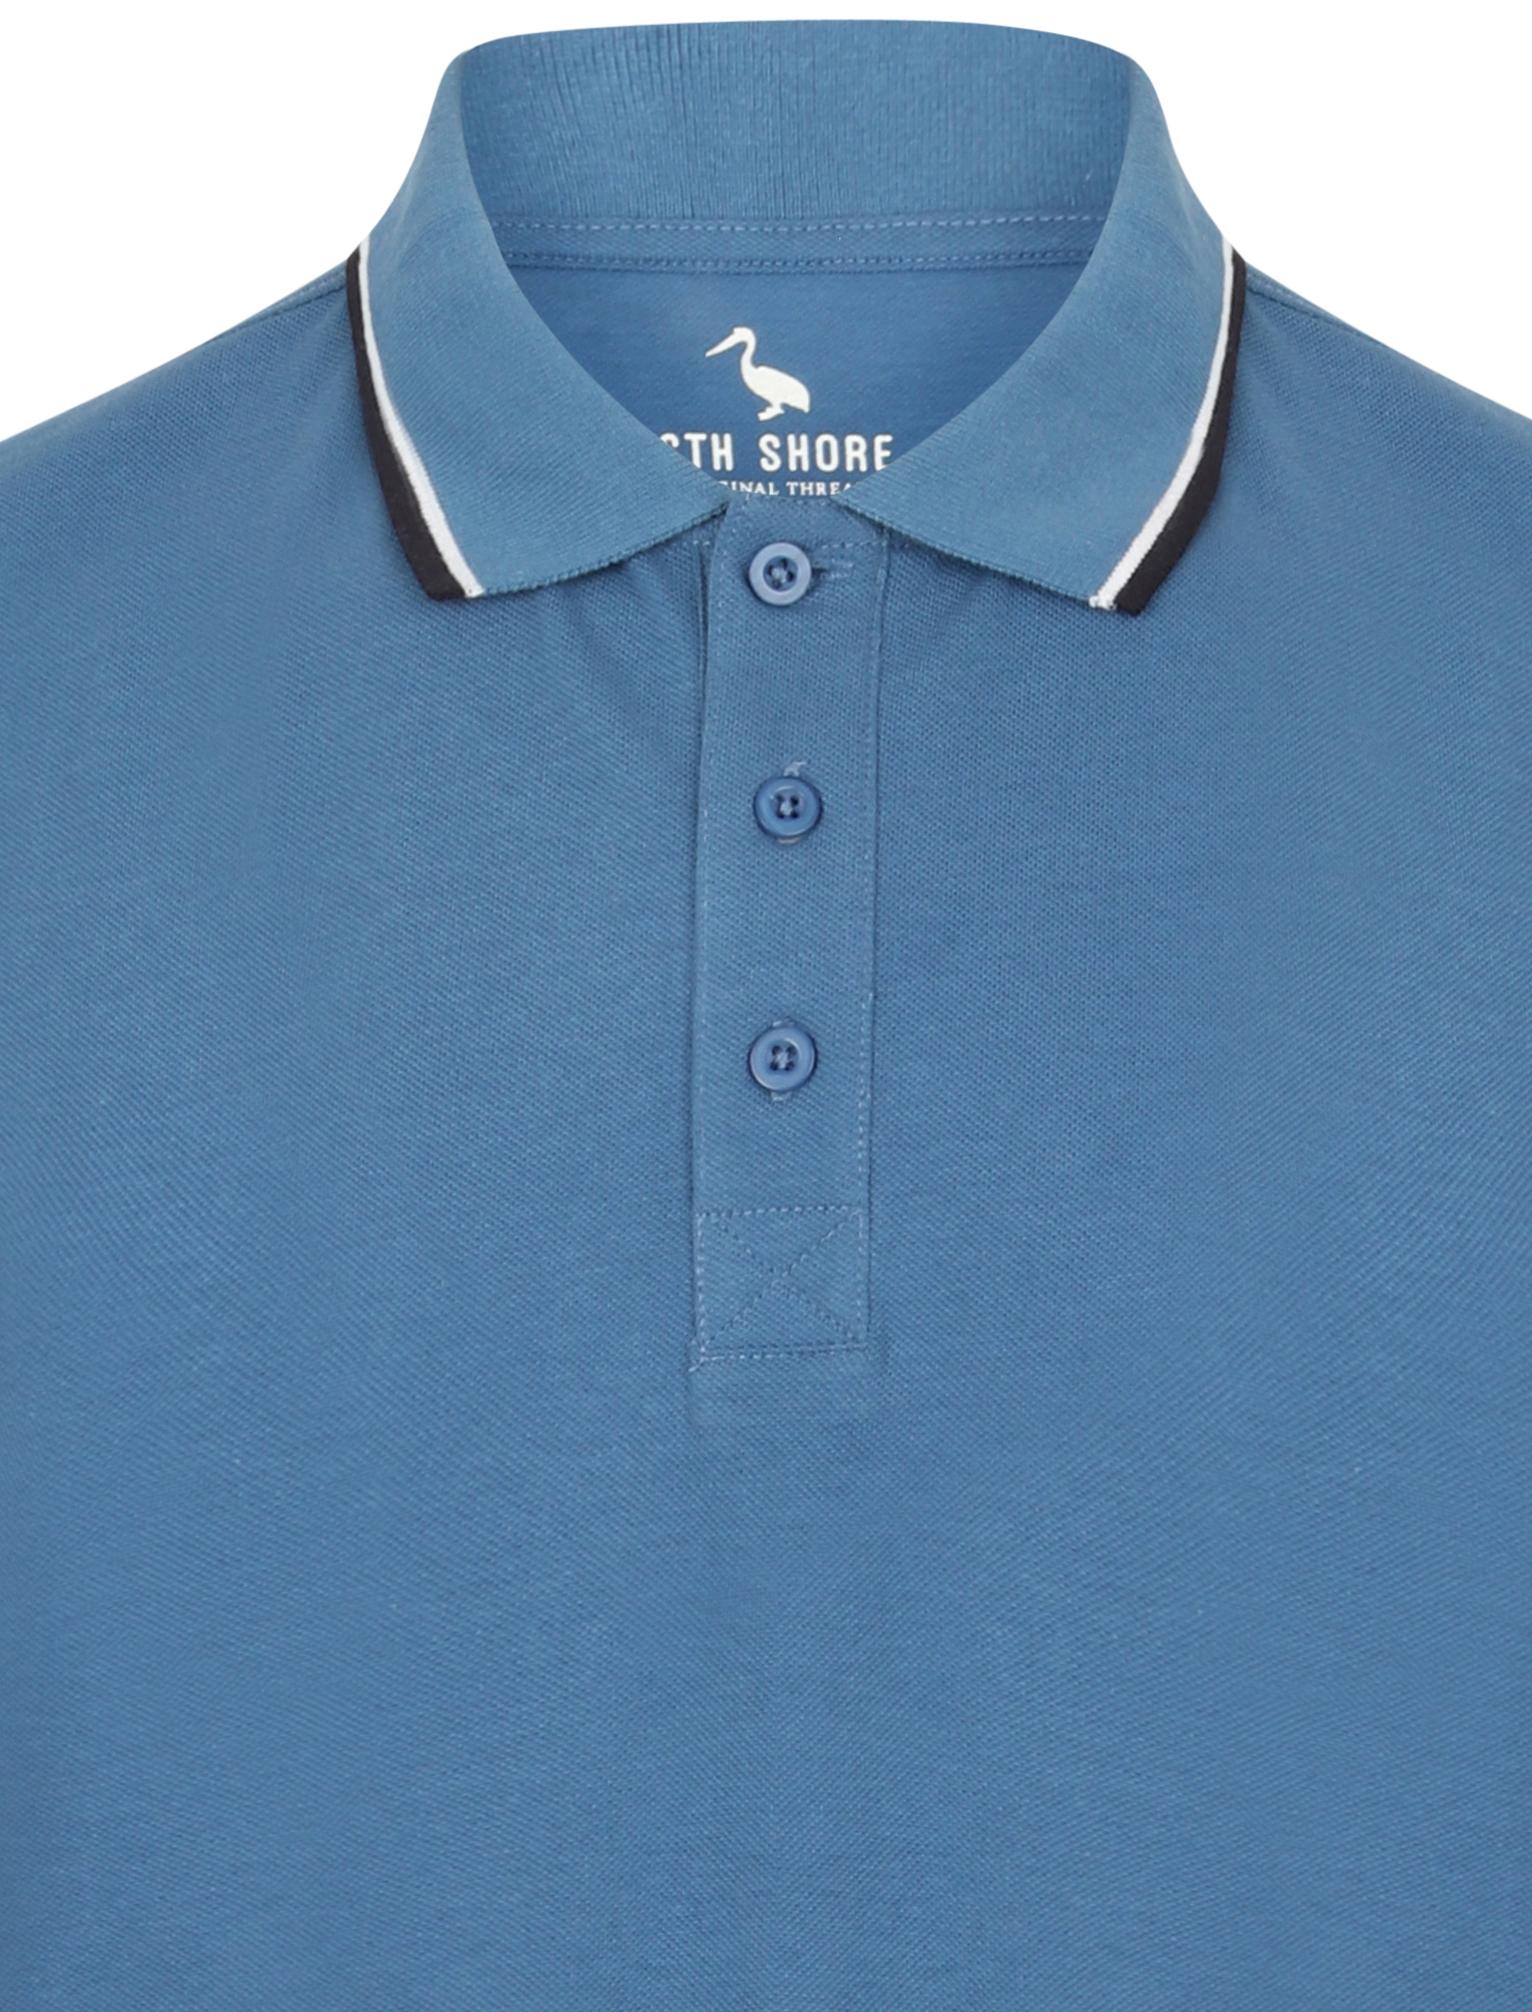 Sth-Shore-Mens-Plain-Polo-Shirt-100-Pique-Cotton-T-Shirt-Top-Collar-Size-M-XXL thumbnail 12